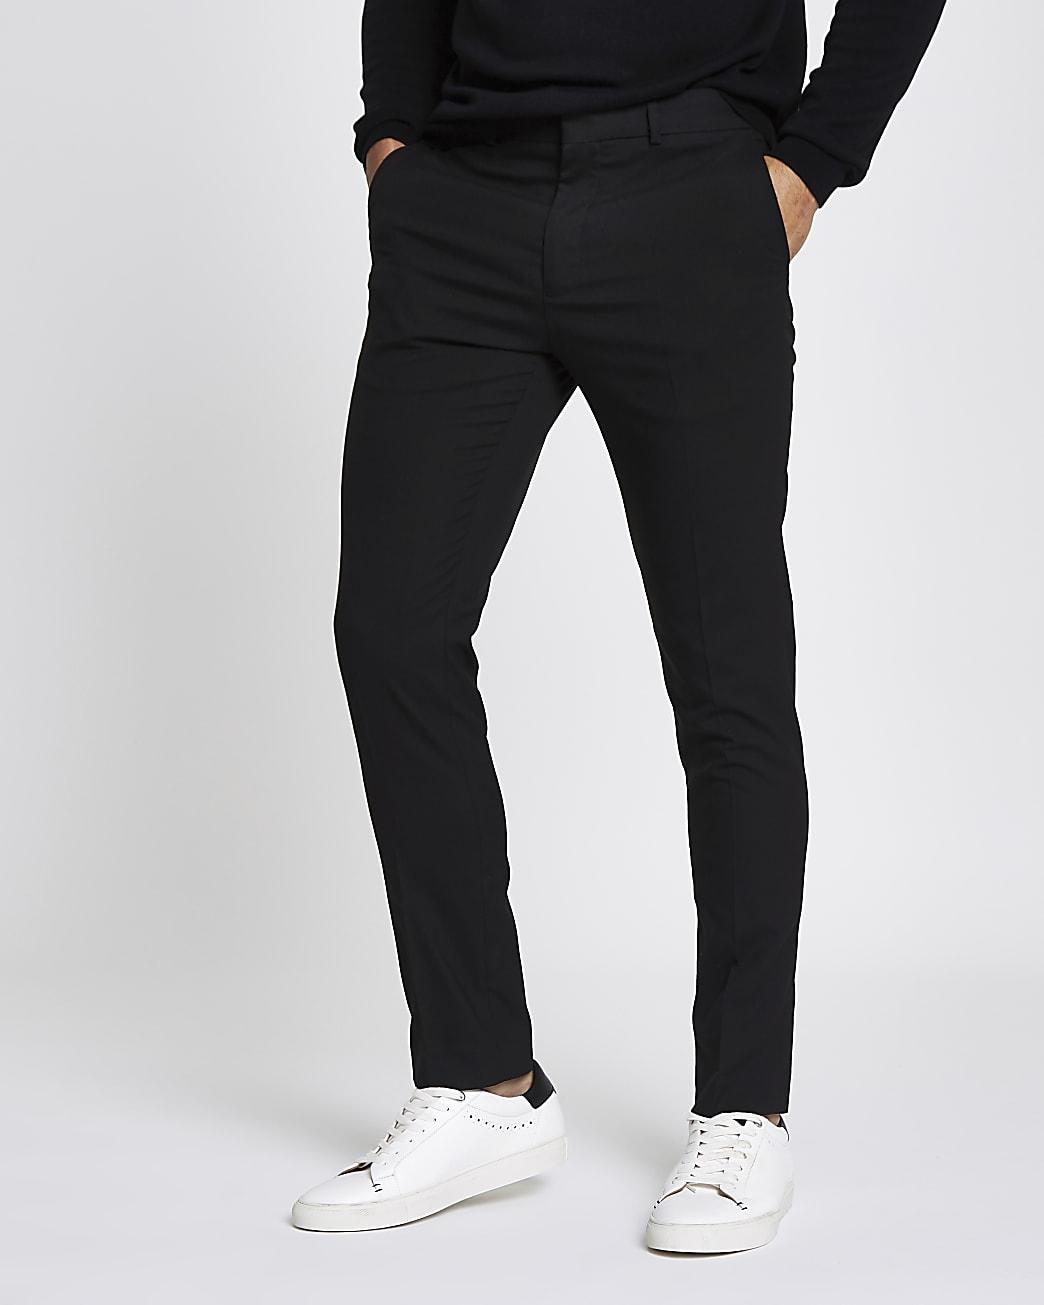 Black skinny fit smart trousers